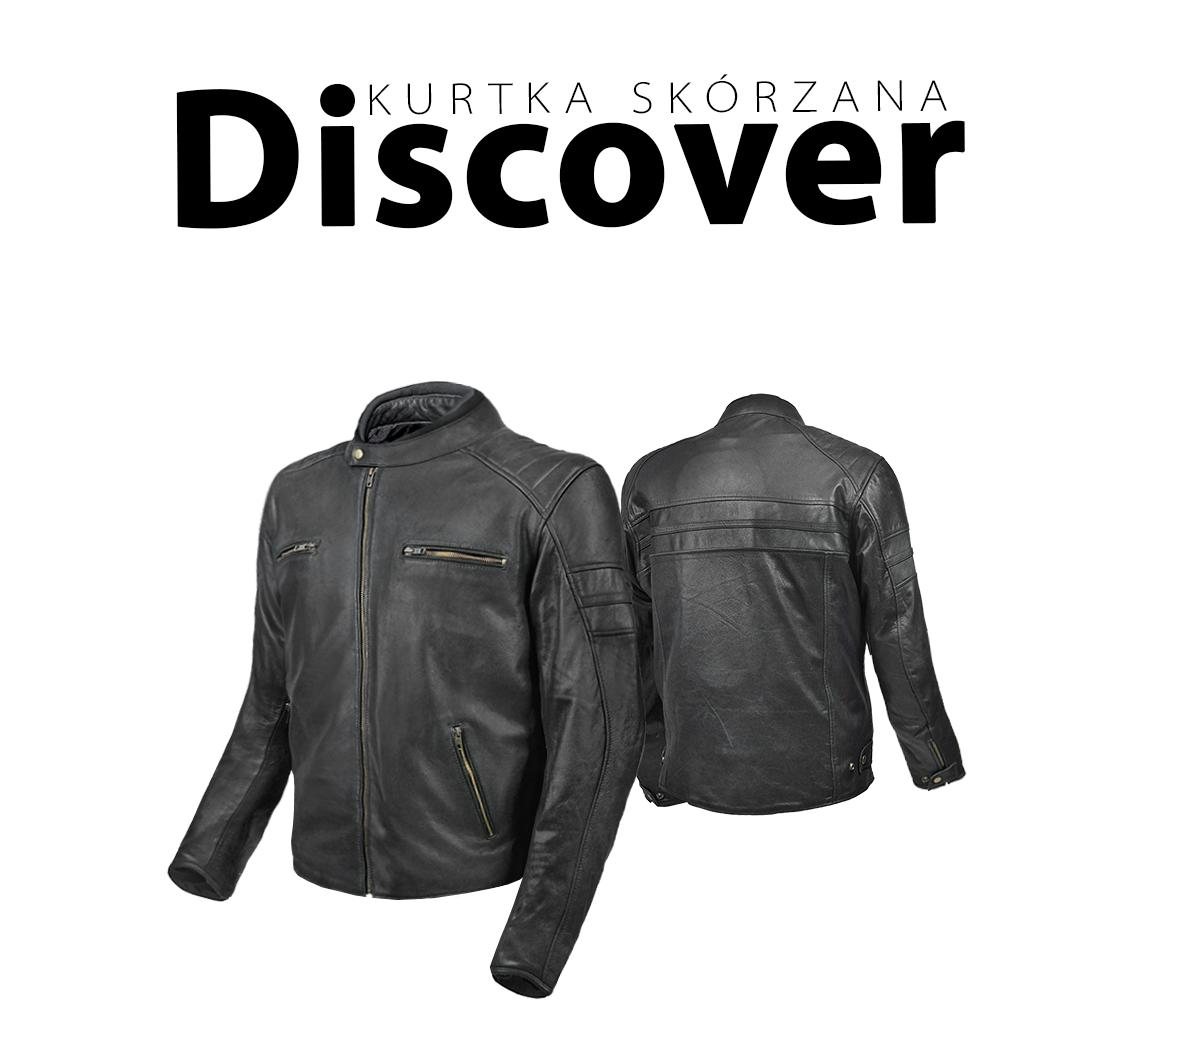 Discover Meska Kurtka Skorzana Denim Jacket Jackets Fashion